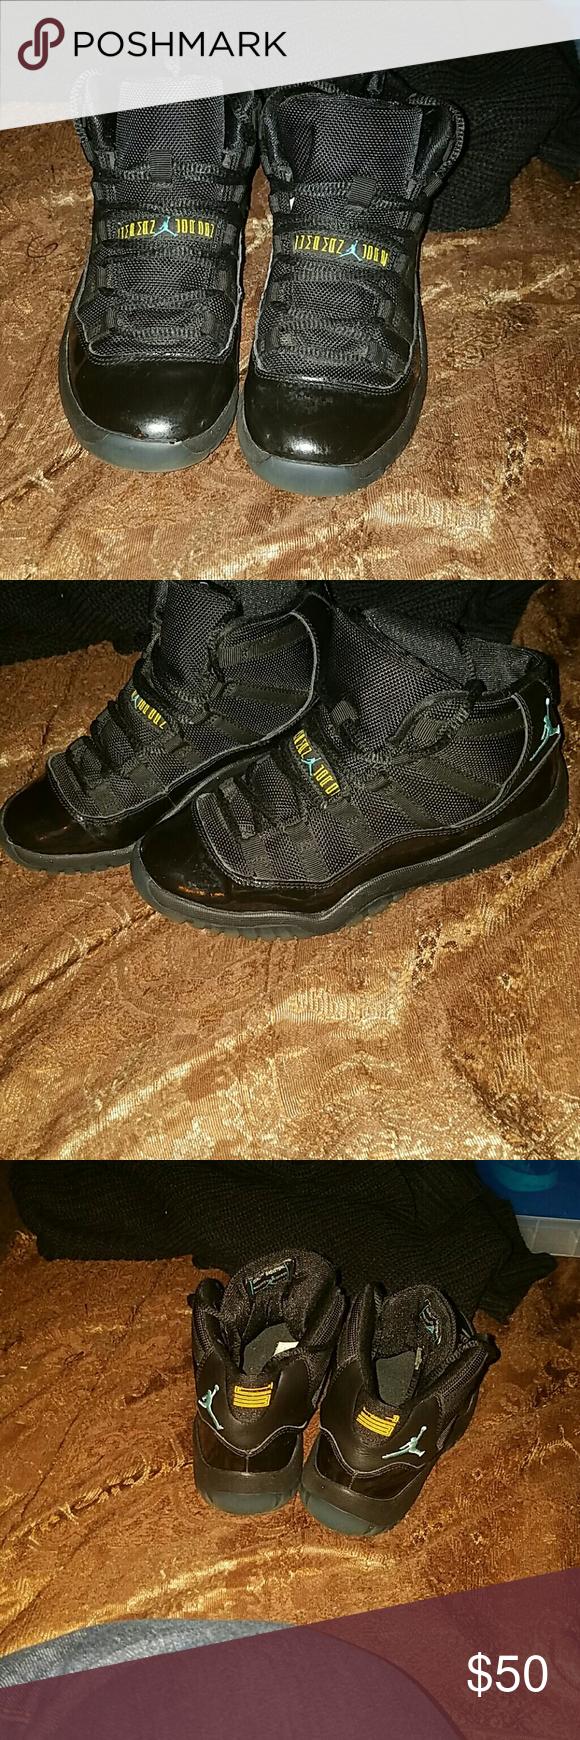 sports shoes d0c4d 96fec Jordan shoes Michael Jordan Kids Shoes Retro 11 Black Cyan 56986 My son  loved these great